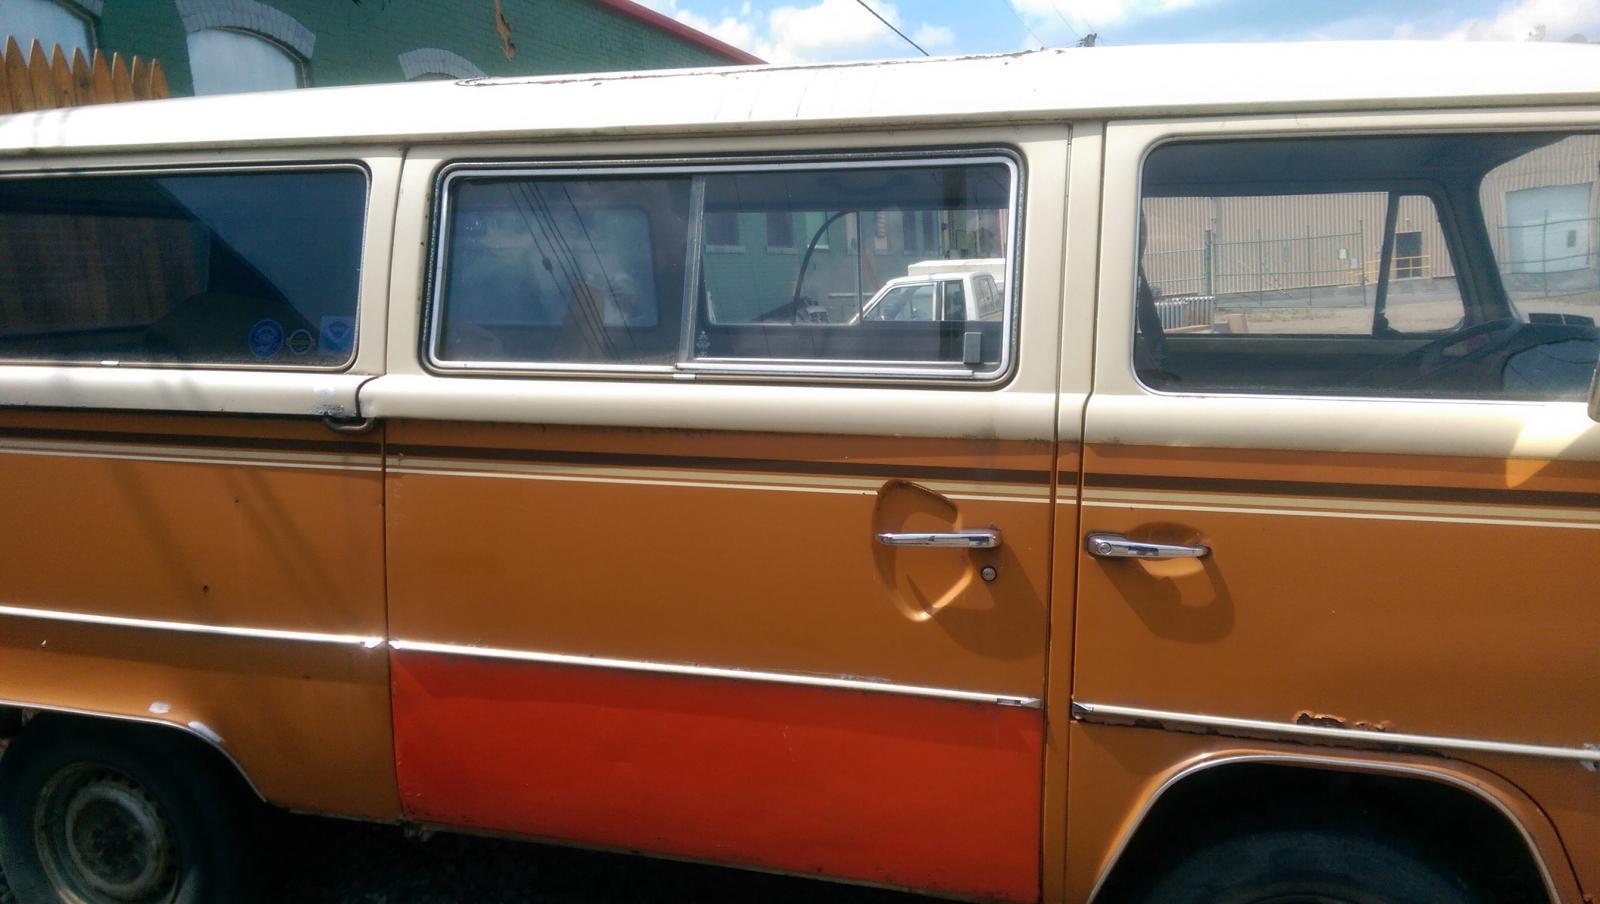 Vw bus find 001